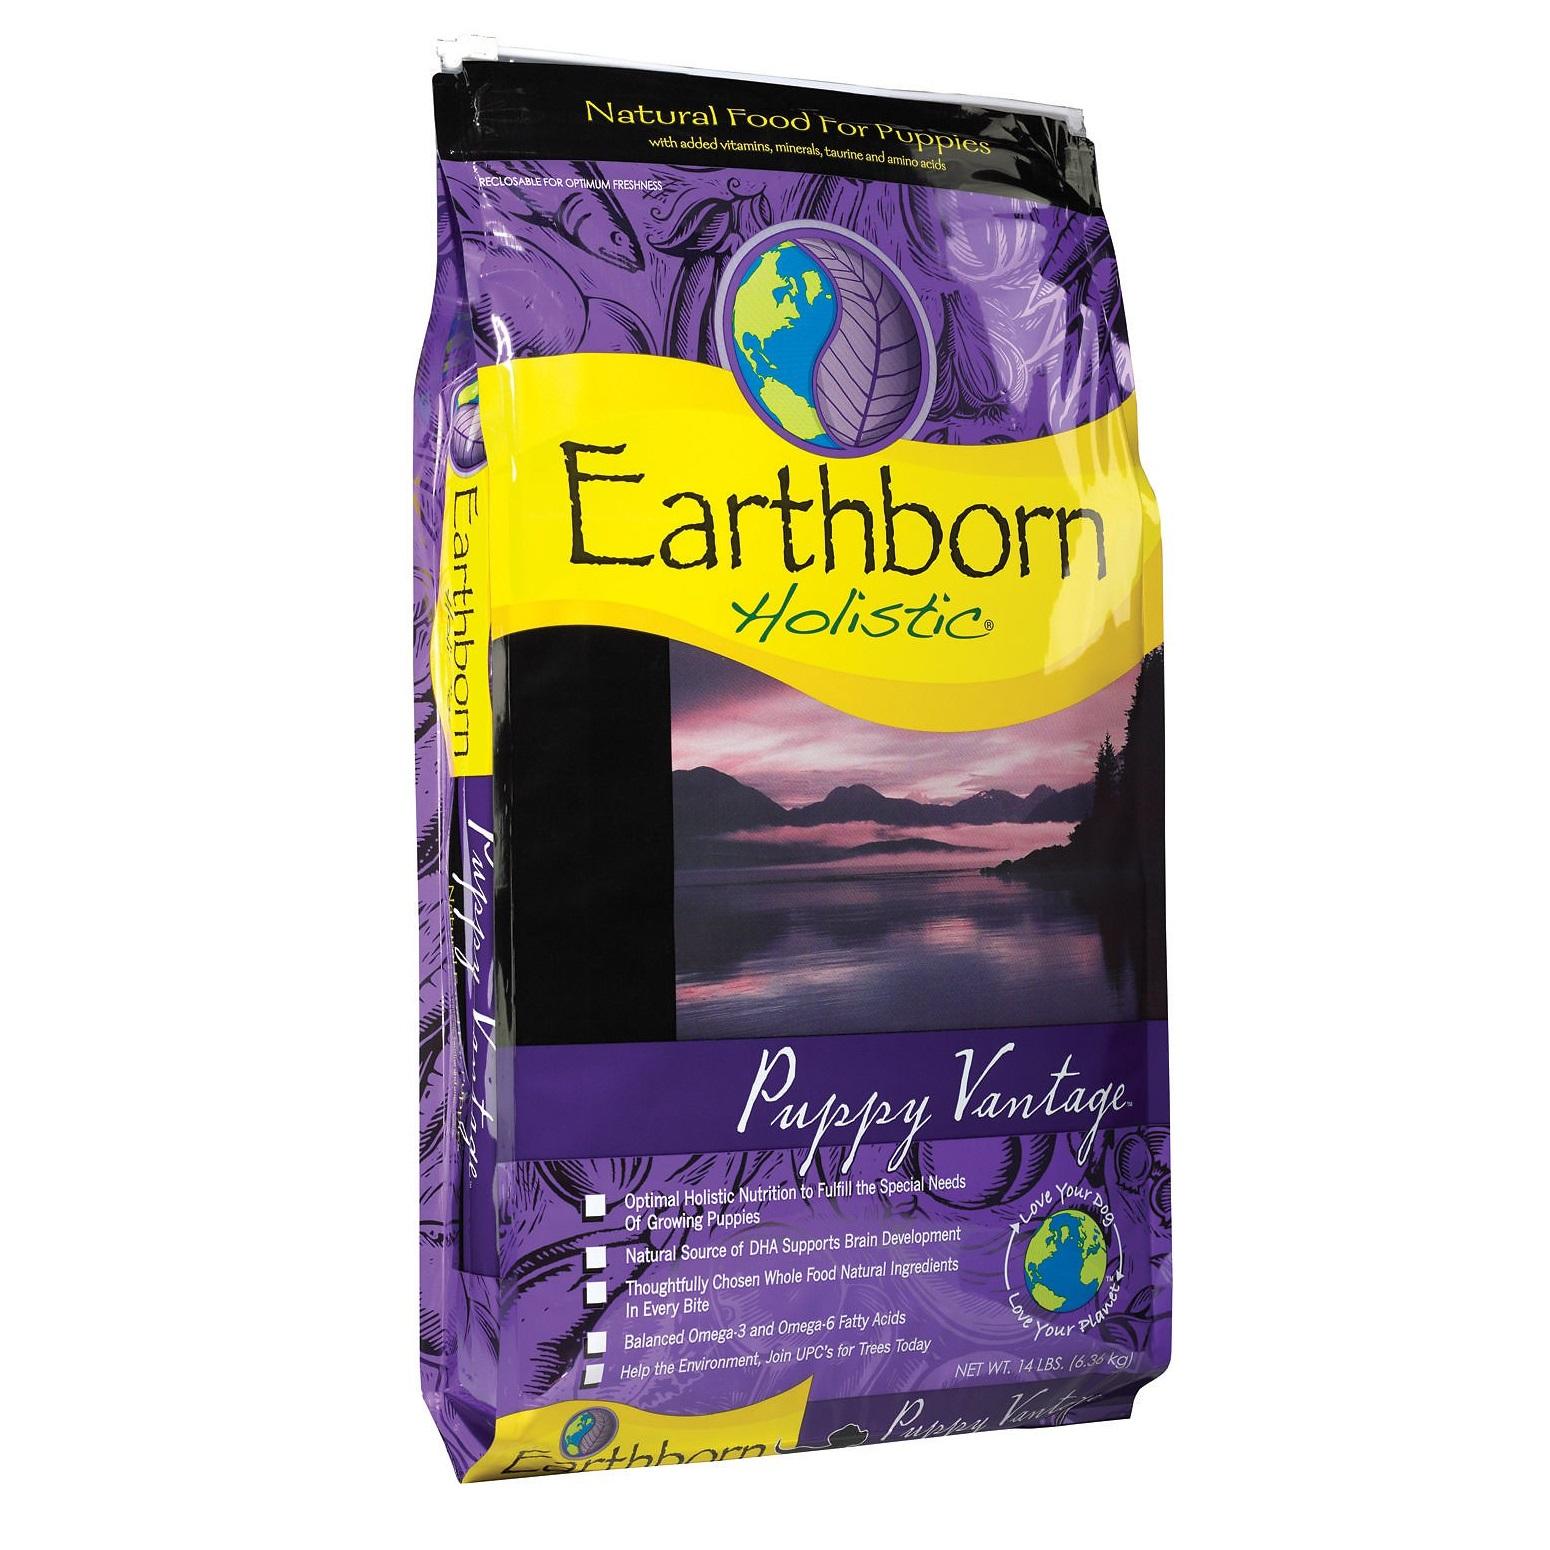 Earthborn Holistic Puppy Vantage Natural Dry Dog Food 14lbs